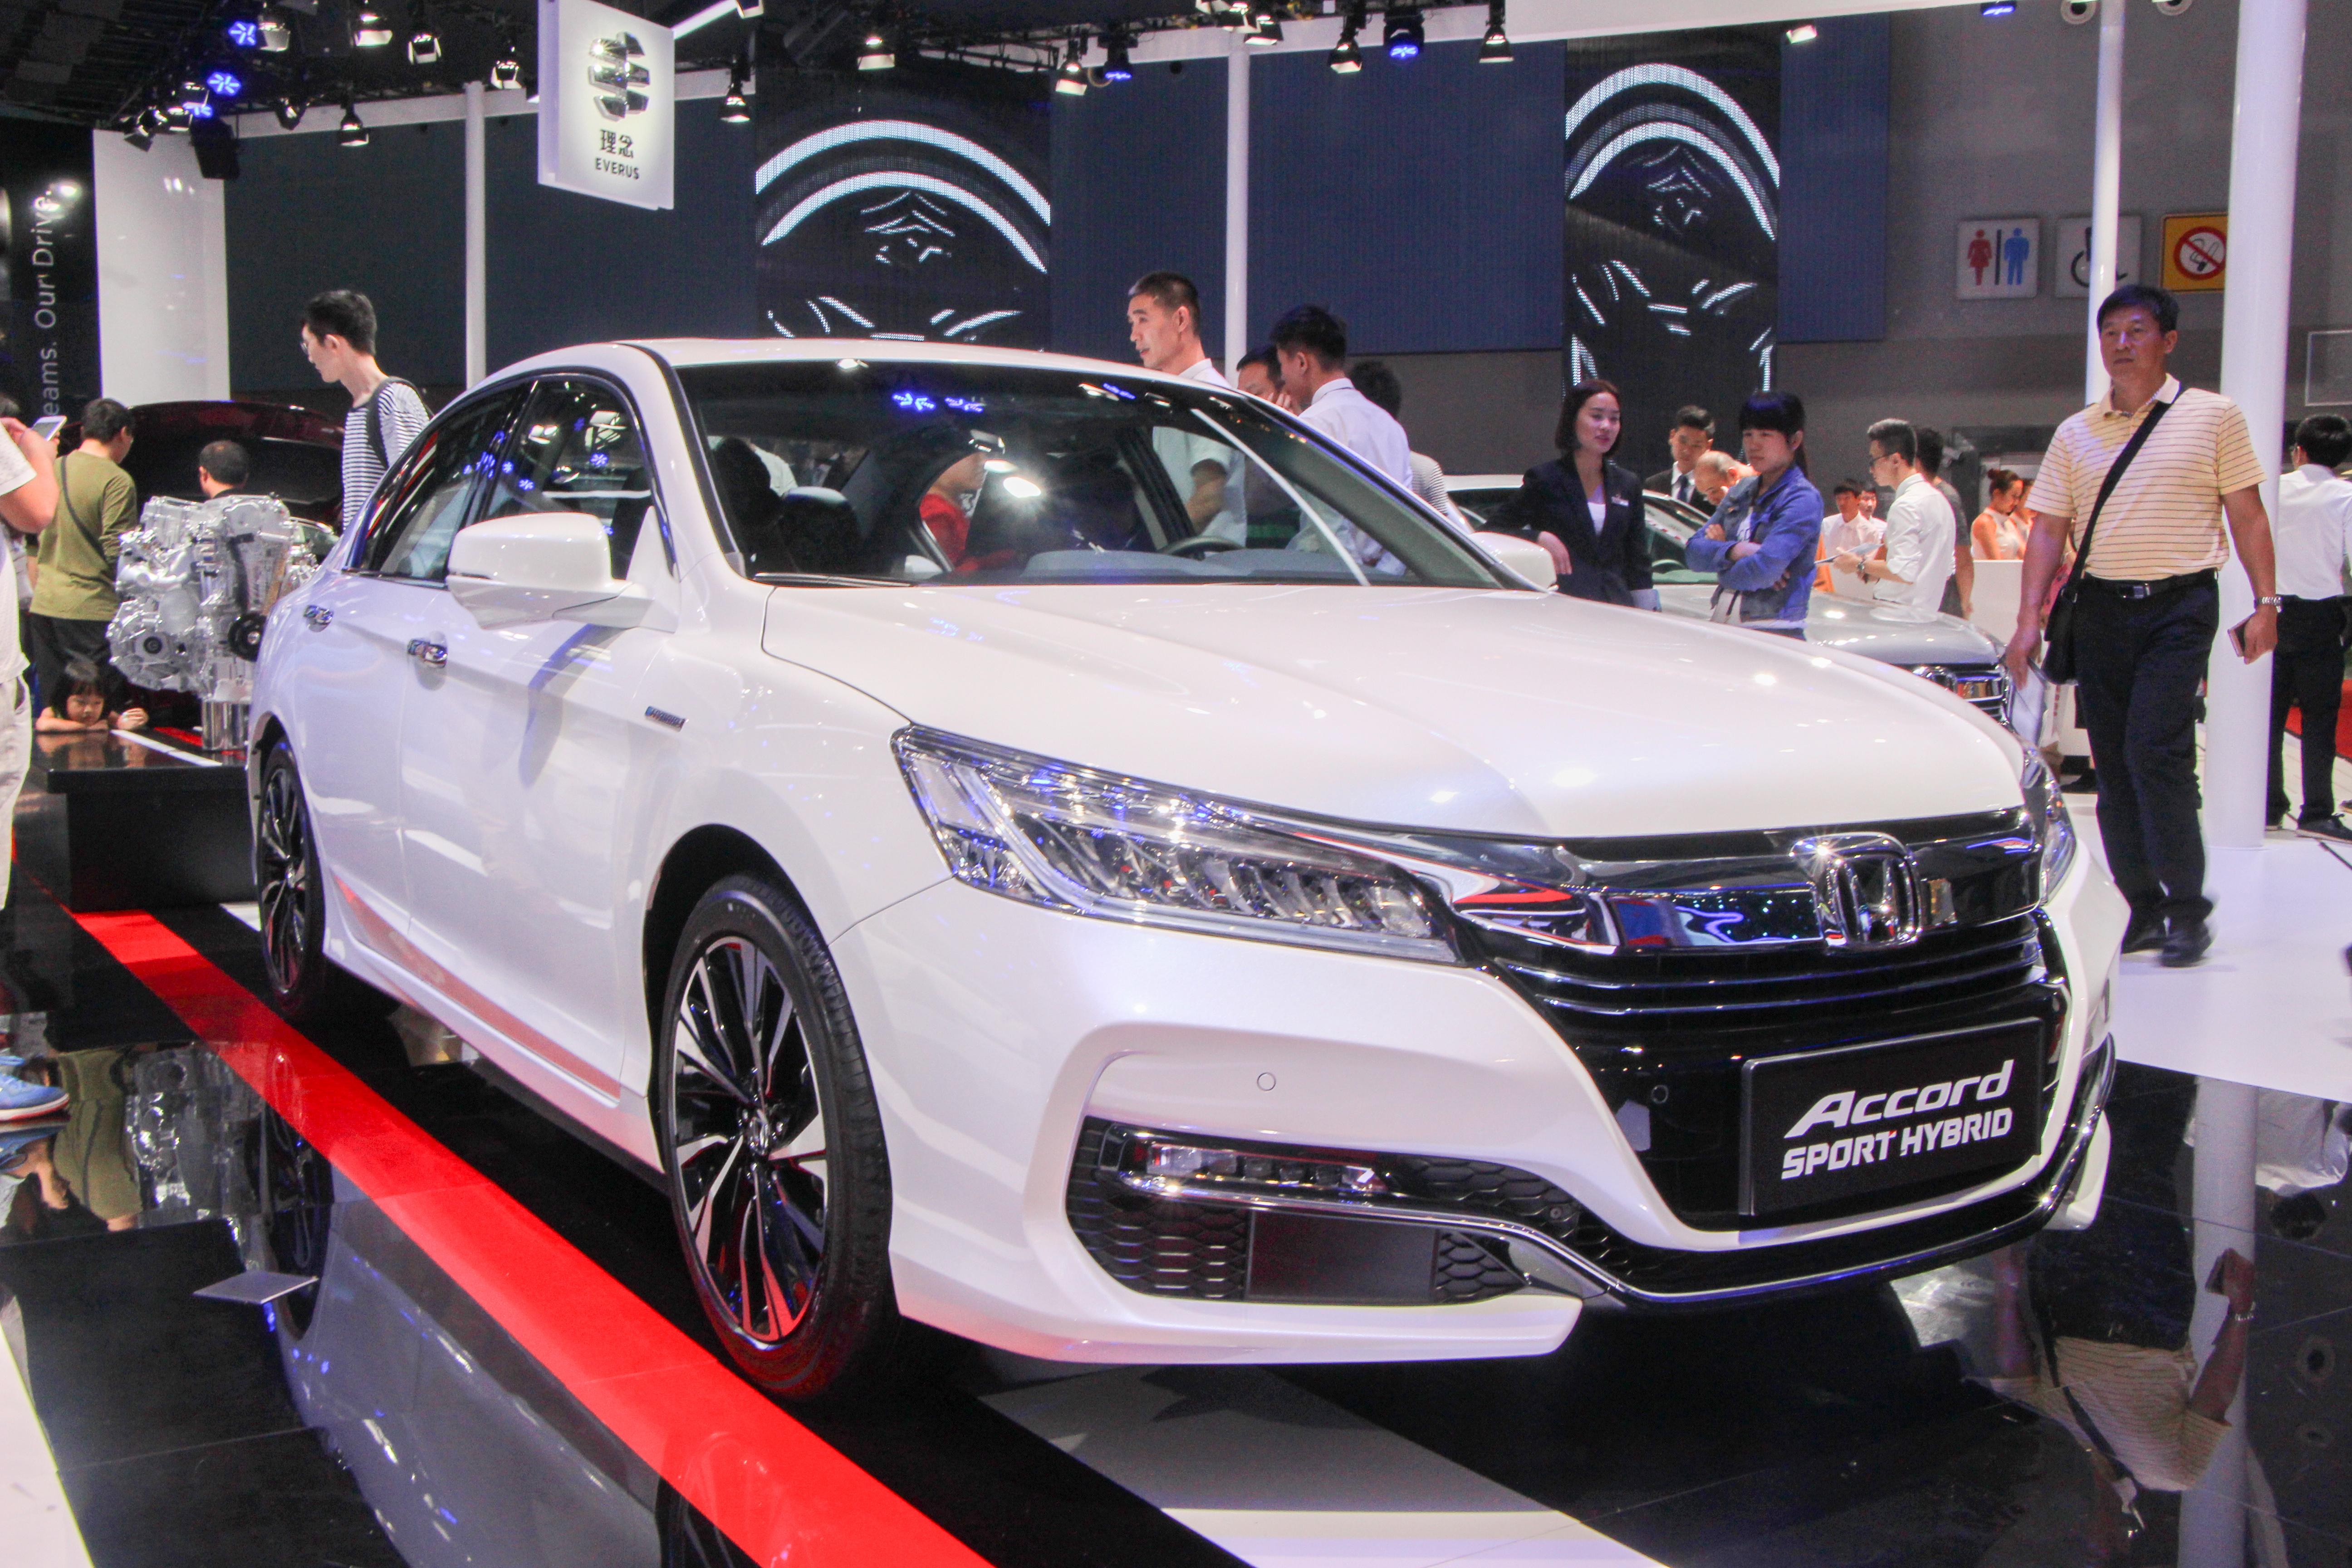 File Honda Accord Hybrid Form Guangzhou Auto Show In 2016 Jpg